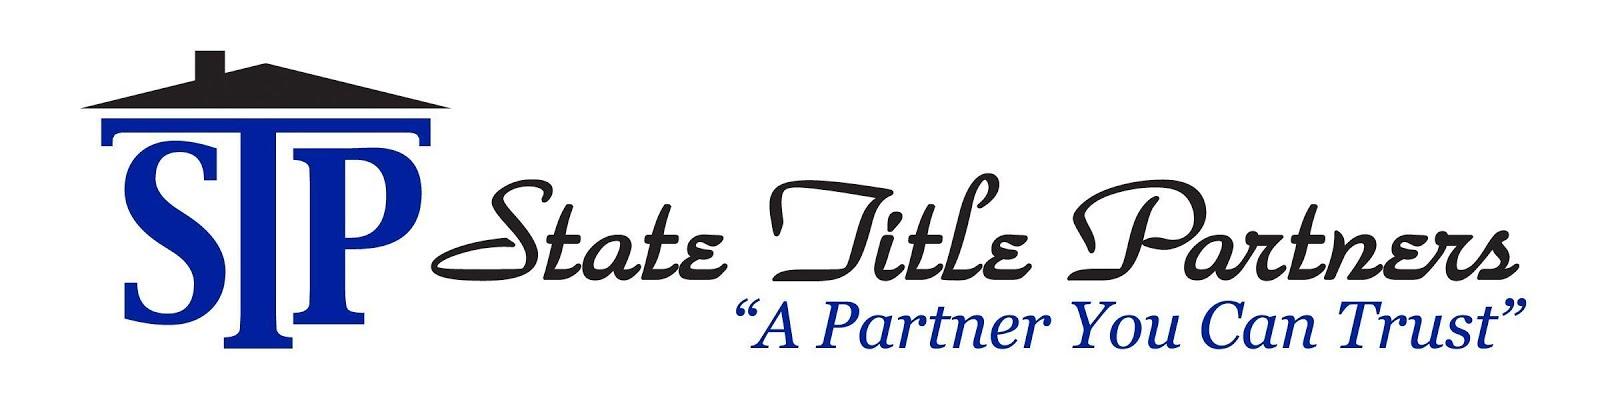 State Title Partners_Final_Logo_copy.jpg